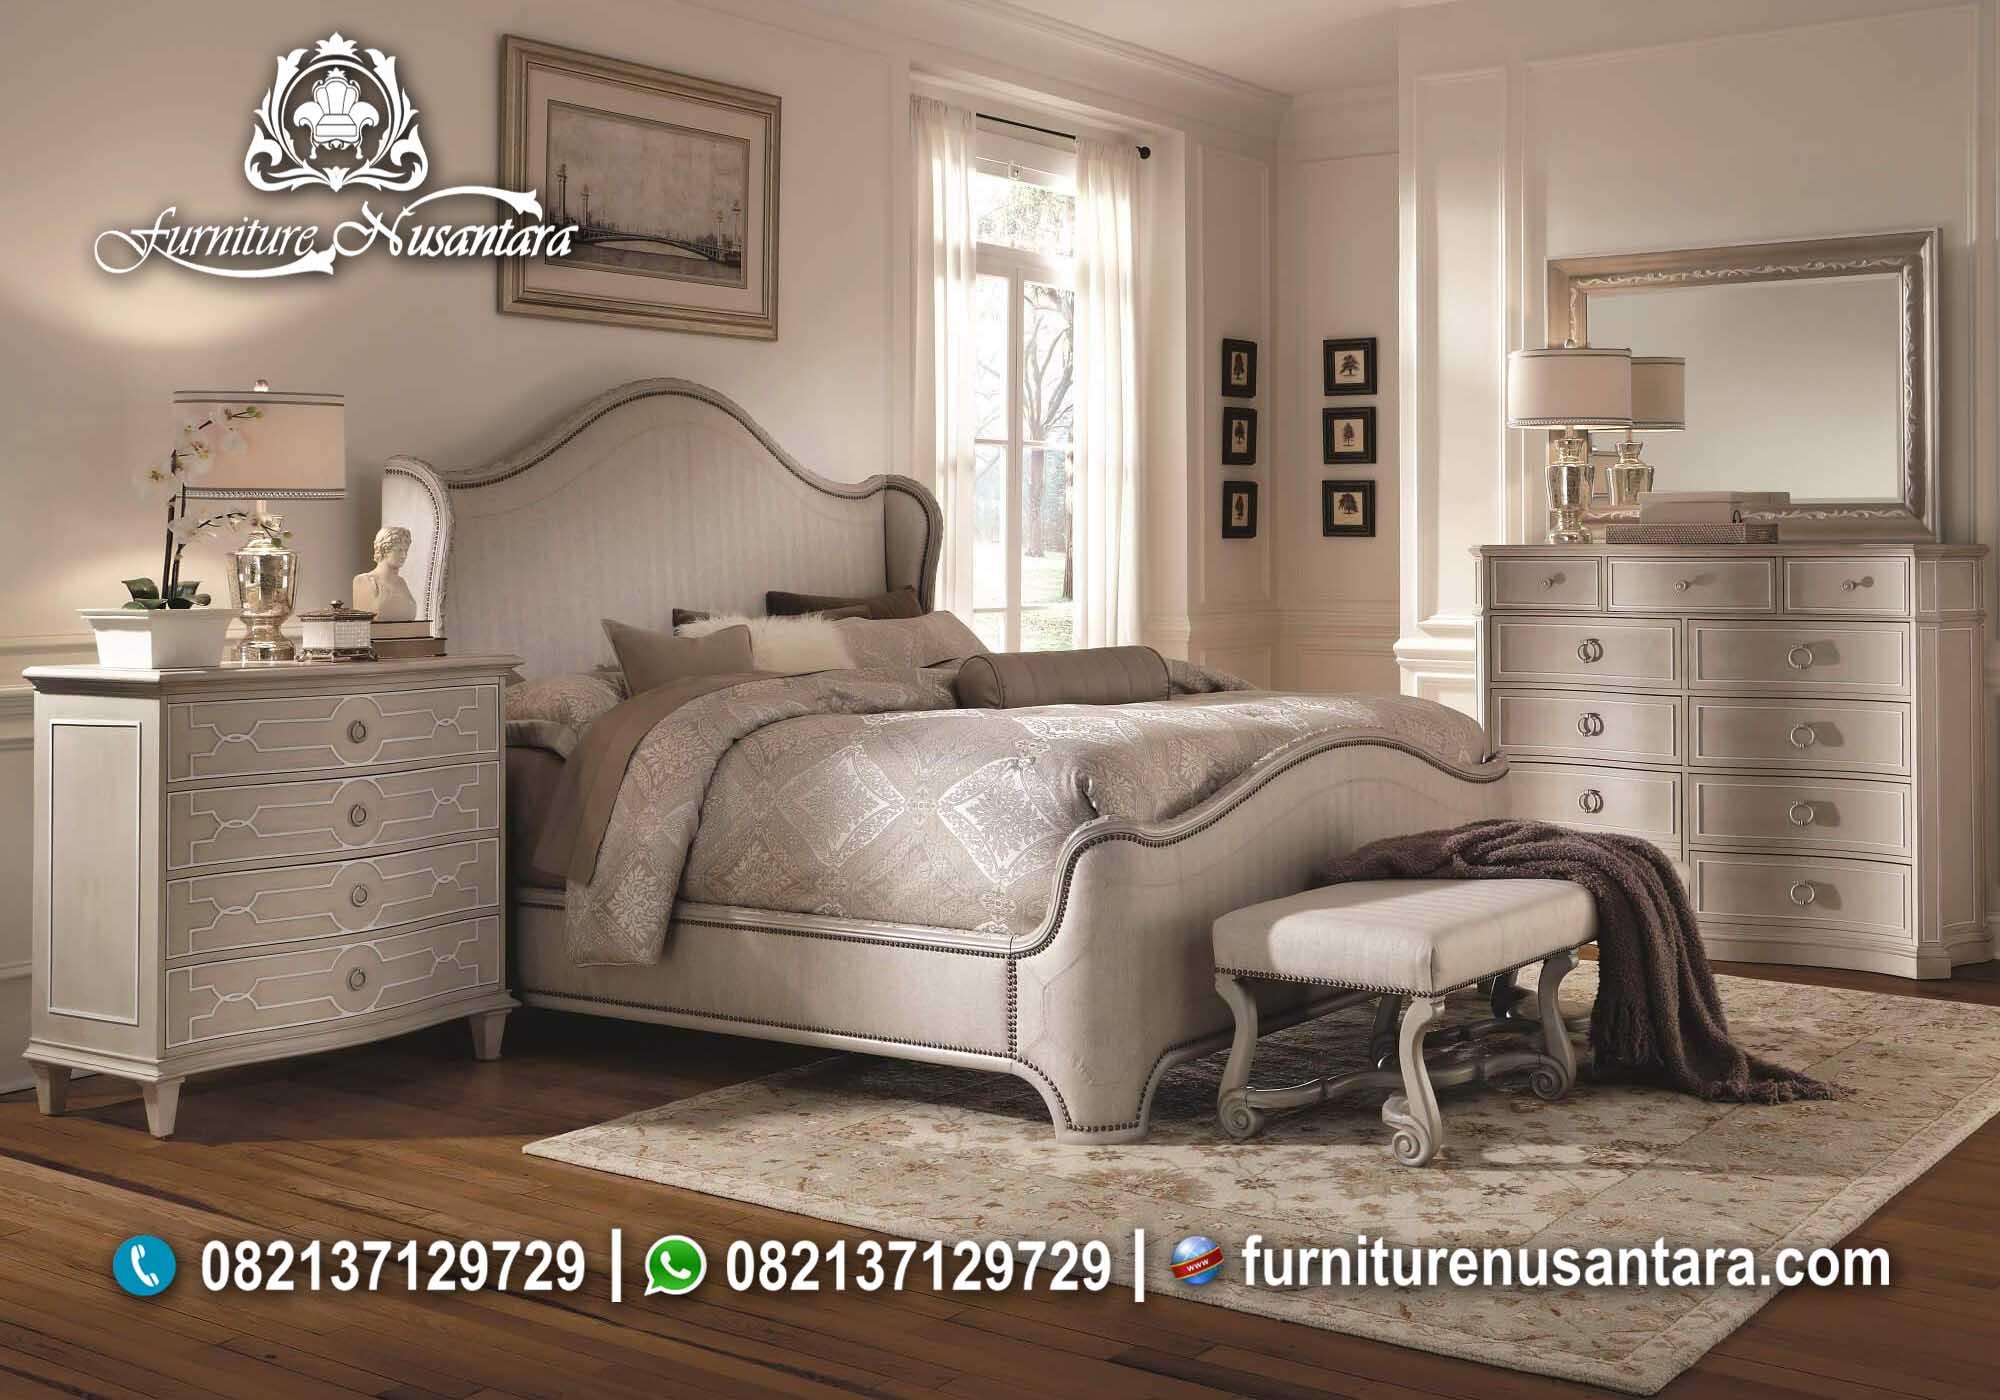 Inspirasi Kamar Tidur Minimalis KS-25, Furniture Nusantara